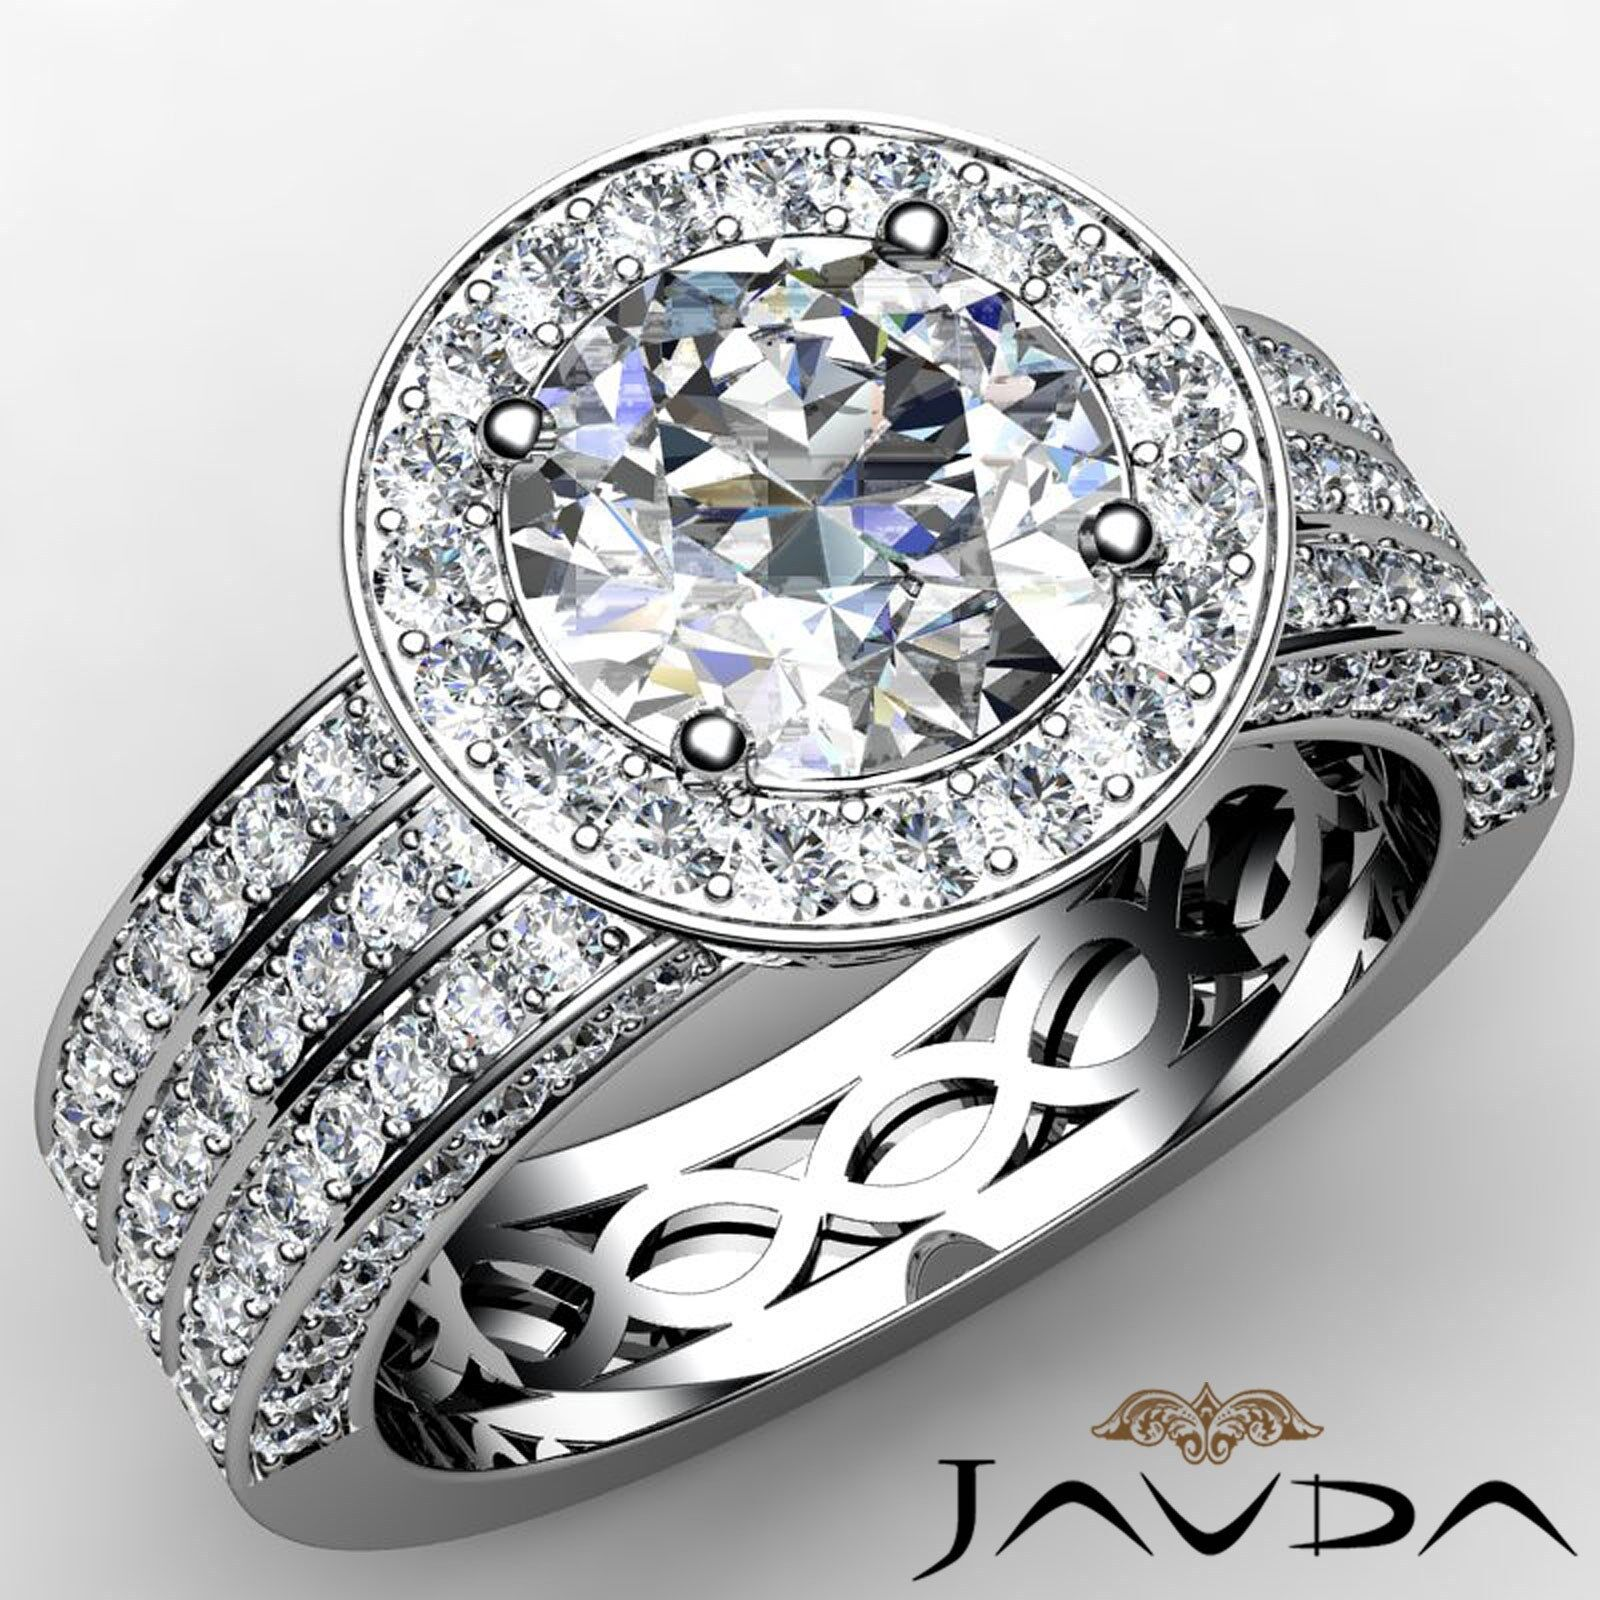 3 Row Round Diamond Halo Pave Engagement Ring GIA F VS2 18k White Gold 2.85ct